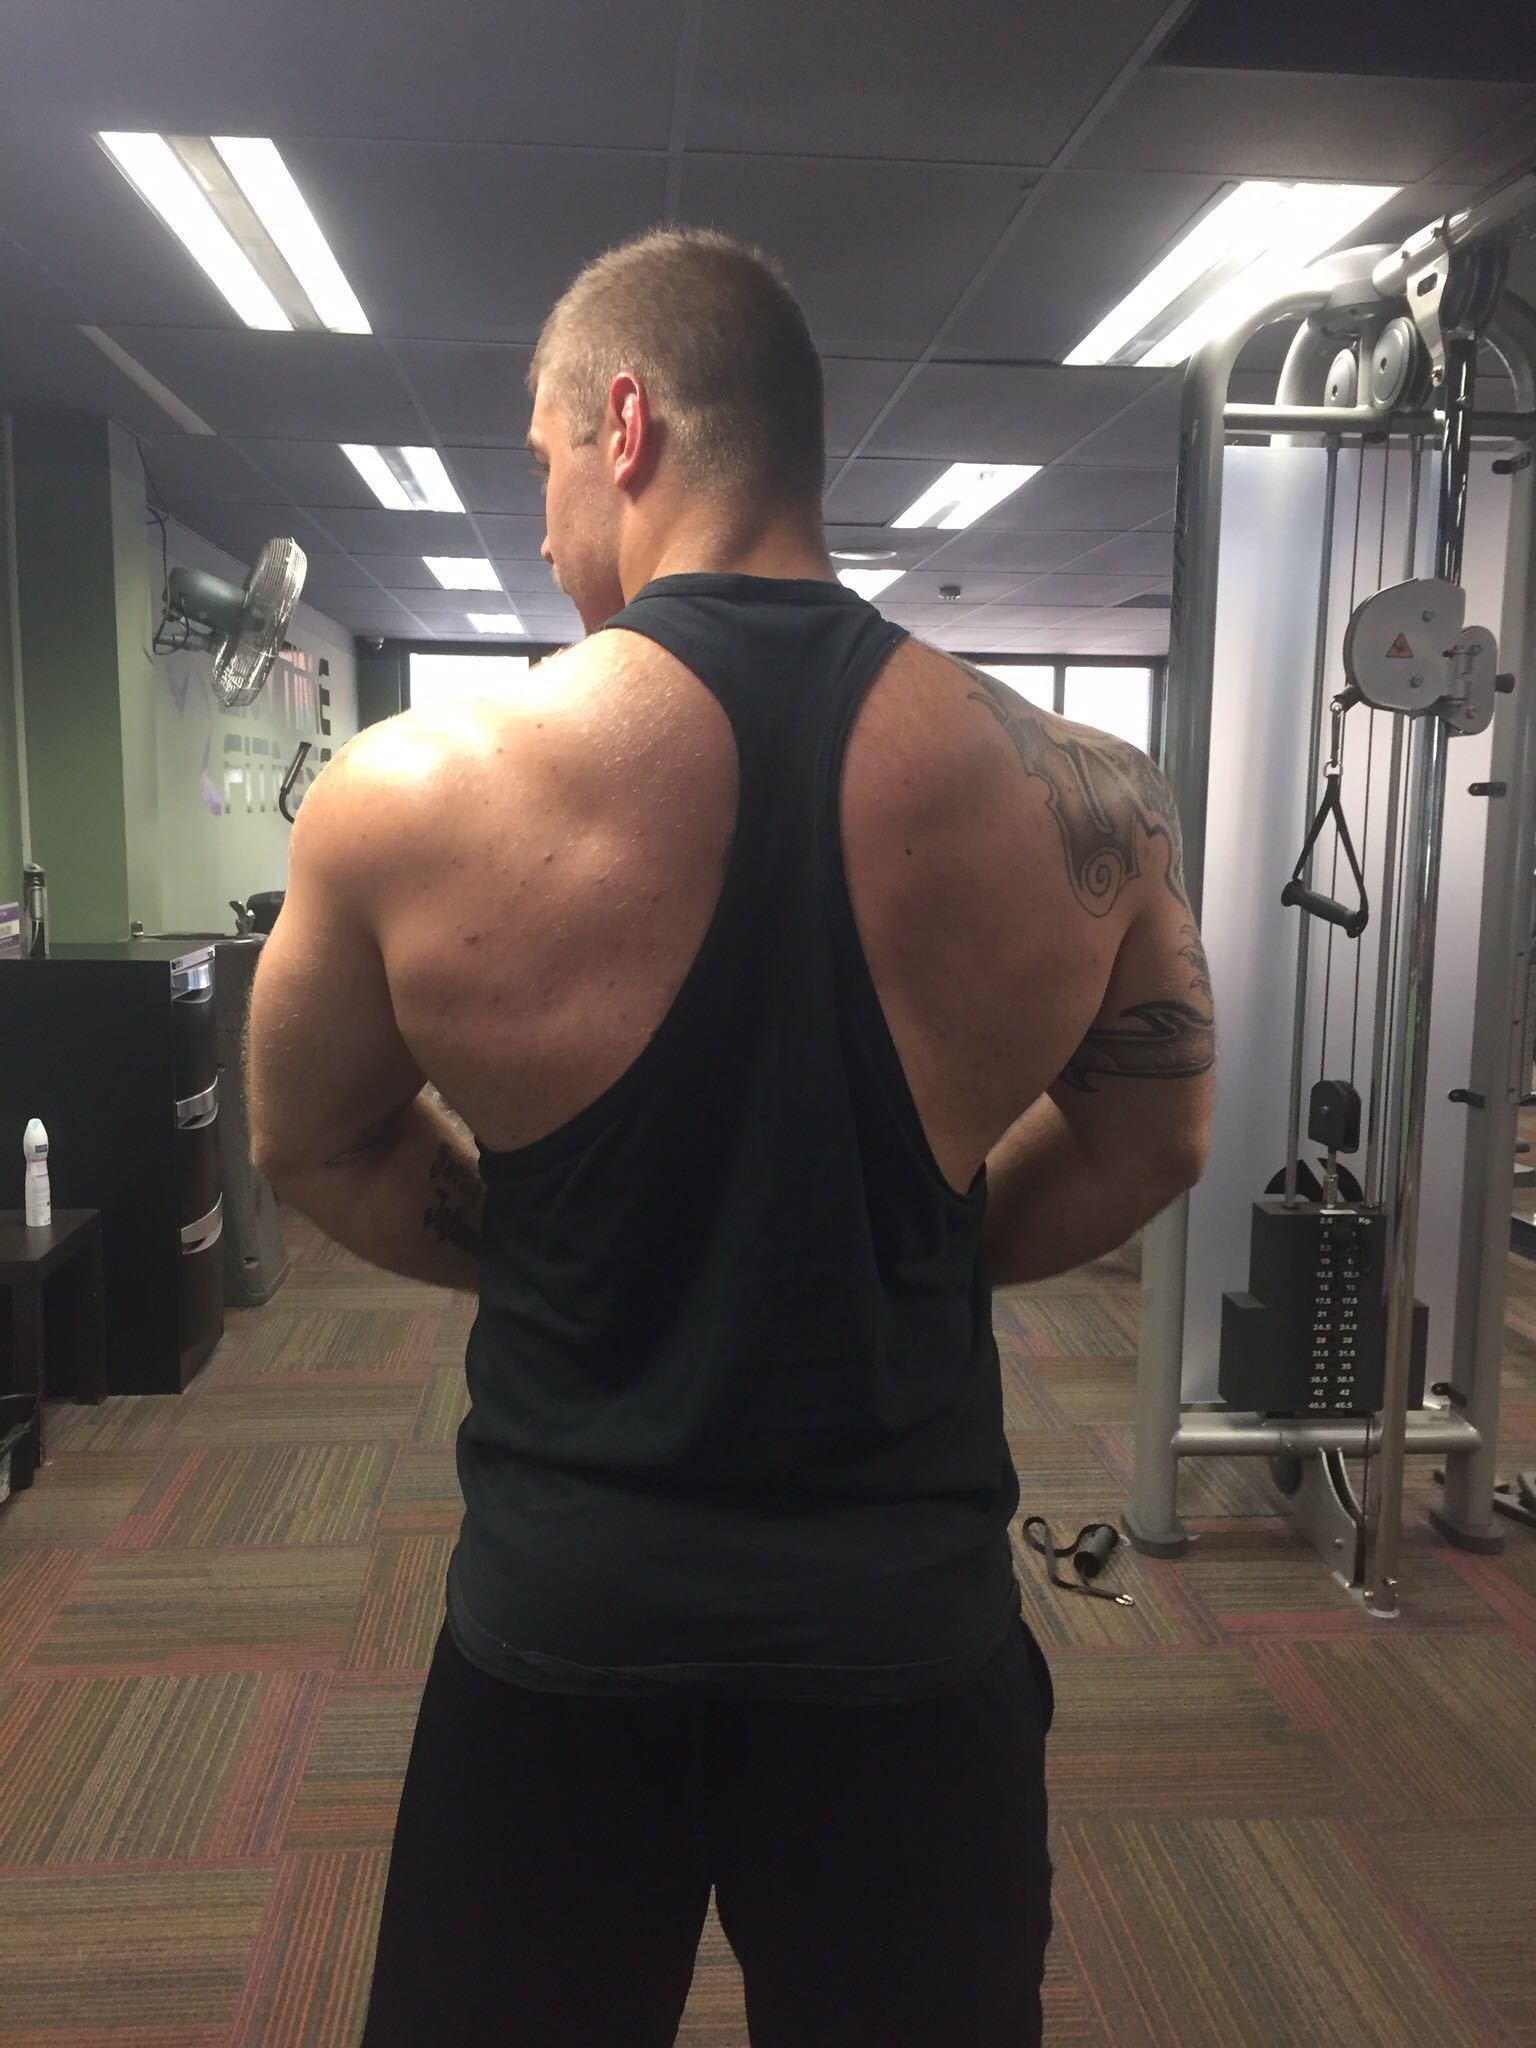 Put face on bodybuilder